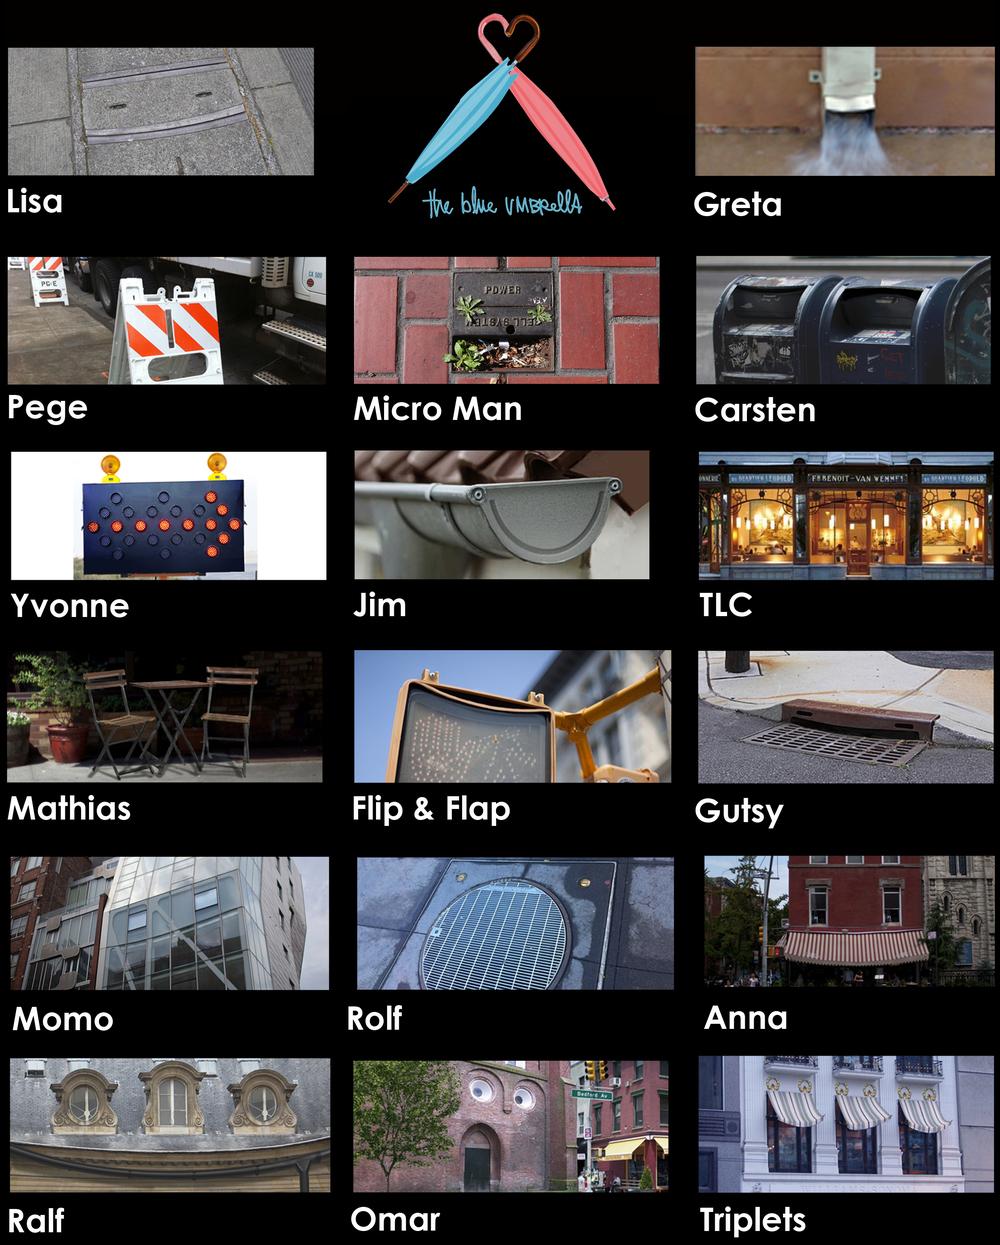 CityFacePoster.5.1.12.flattened.jpg